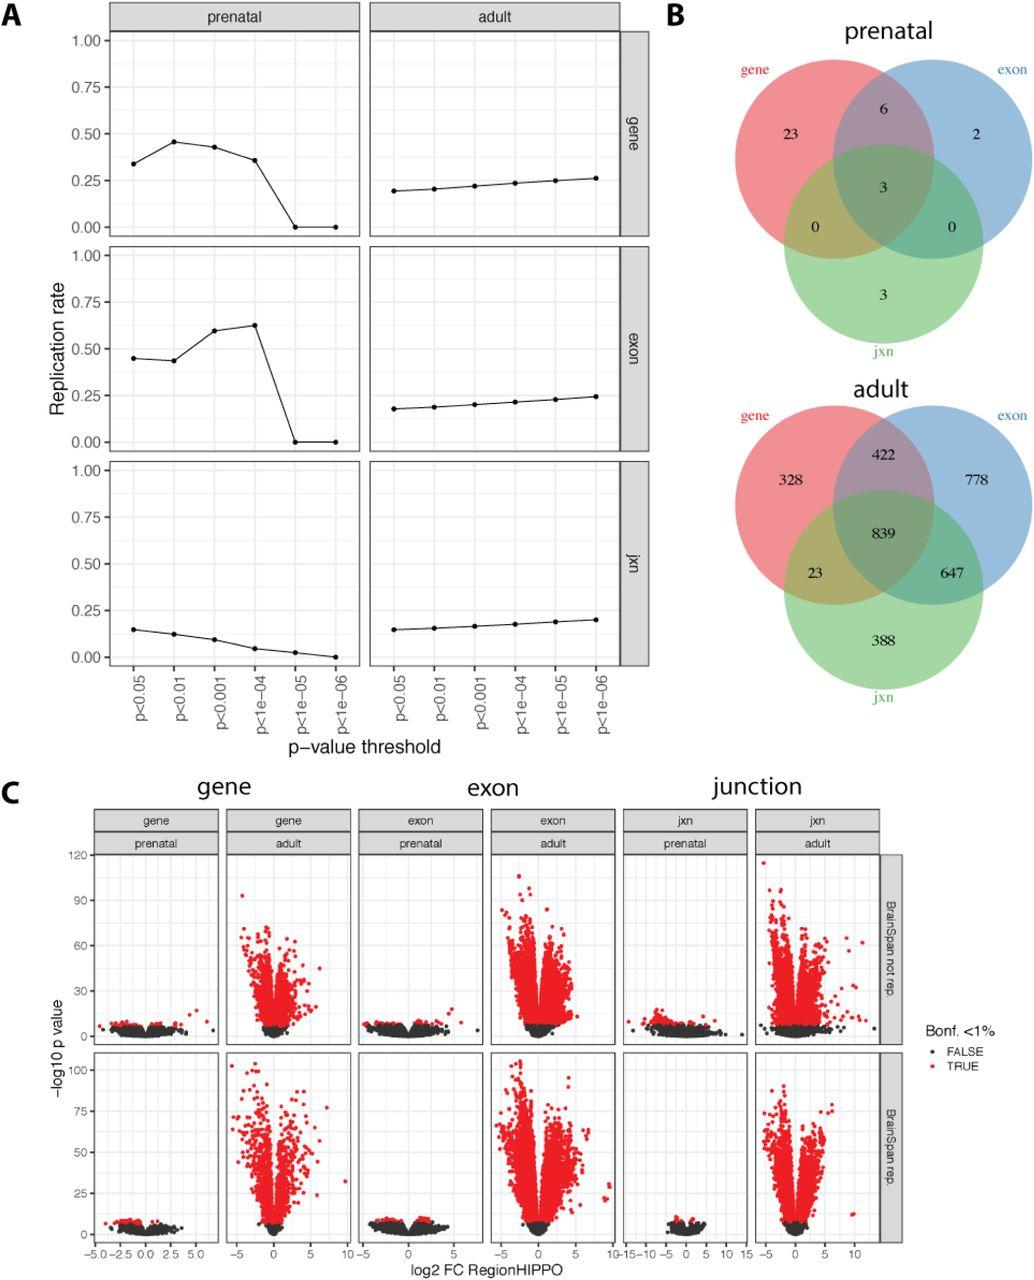 Regional heterogeneity in gene expression, regulation and